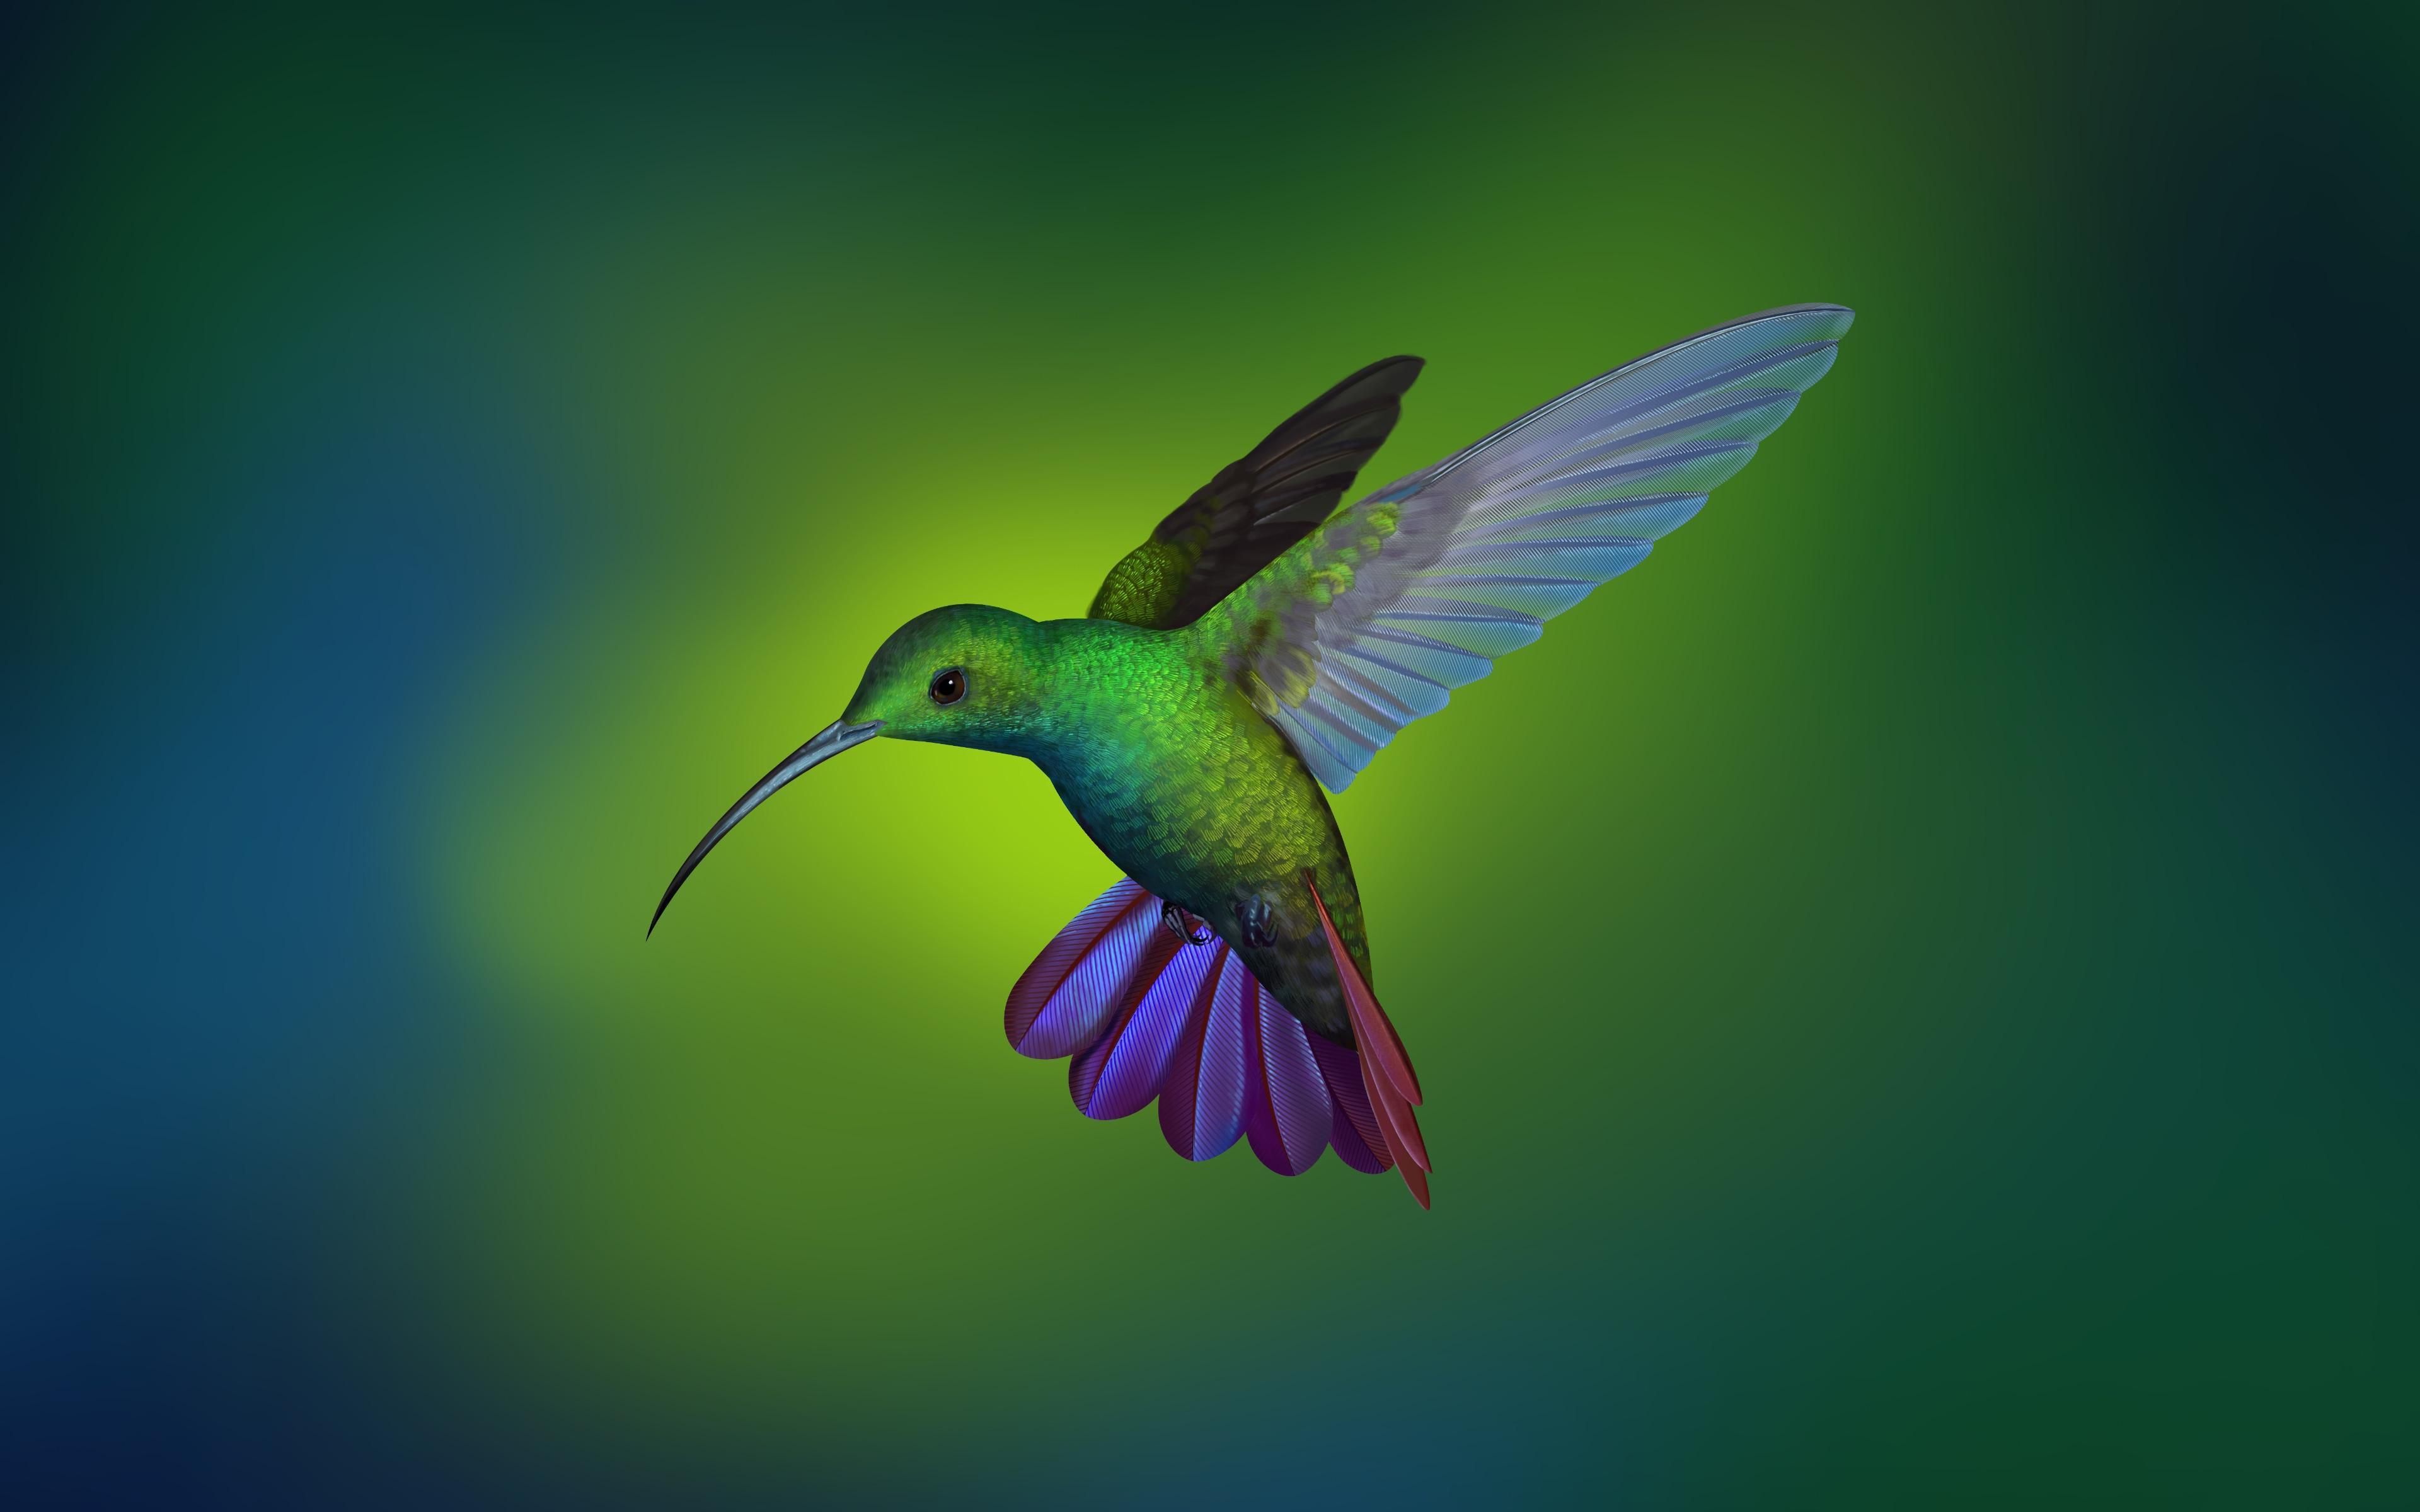 Hummingbird_by_Shu_Le